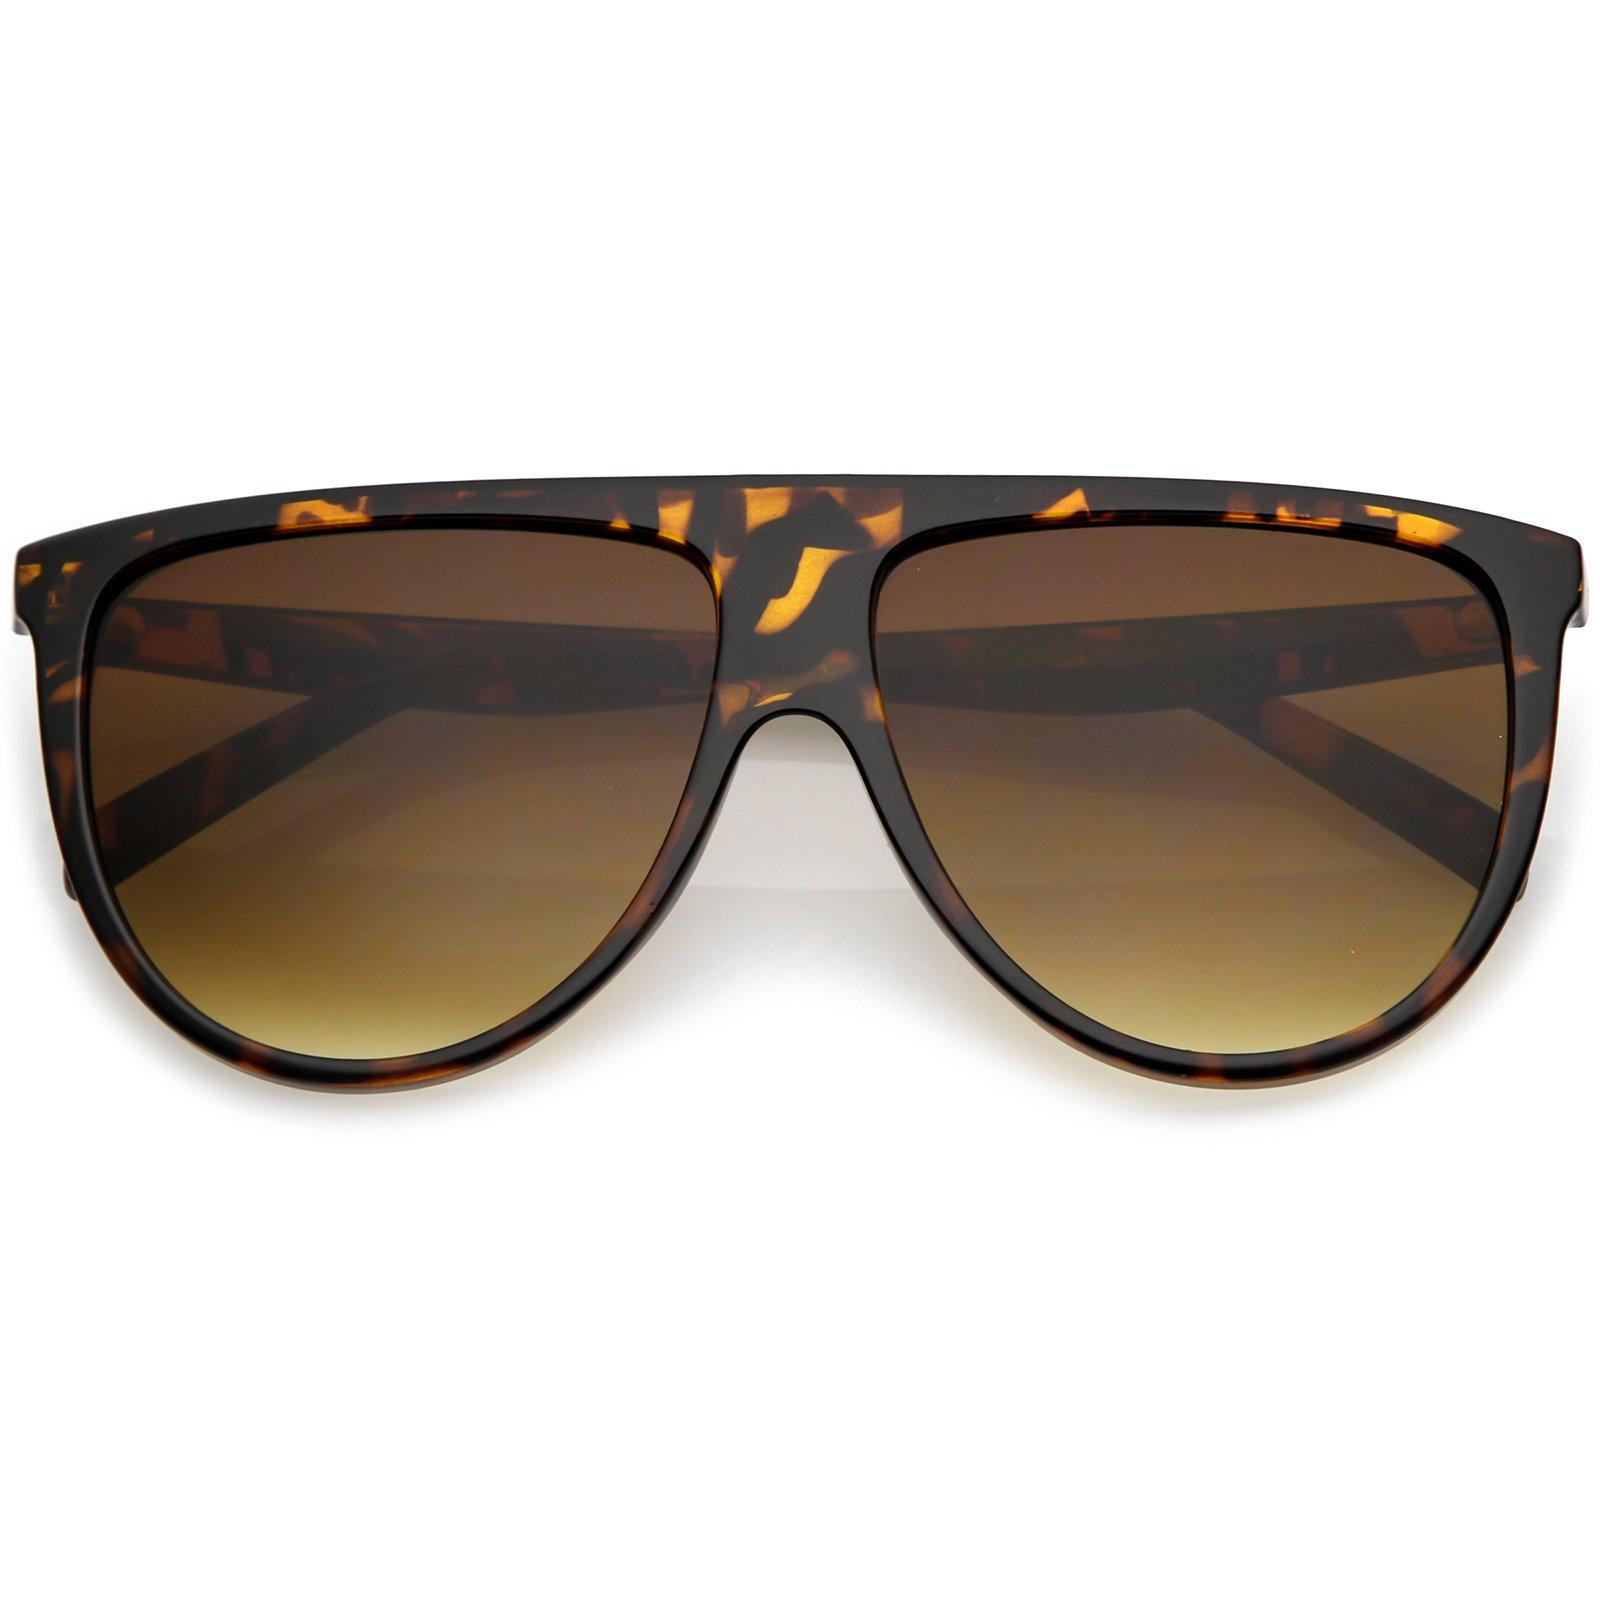 sunglassLA - Modern Oversize Flat Top Aviator Sunglasses With Neutral Color Flat Lens 59mm (Tortoise/Amber)